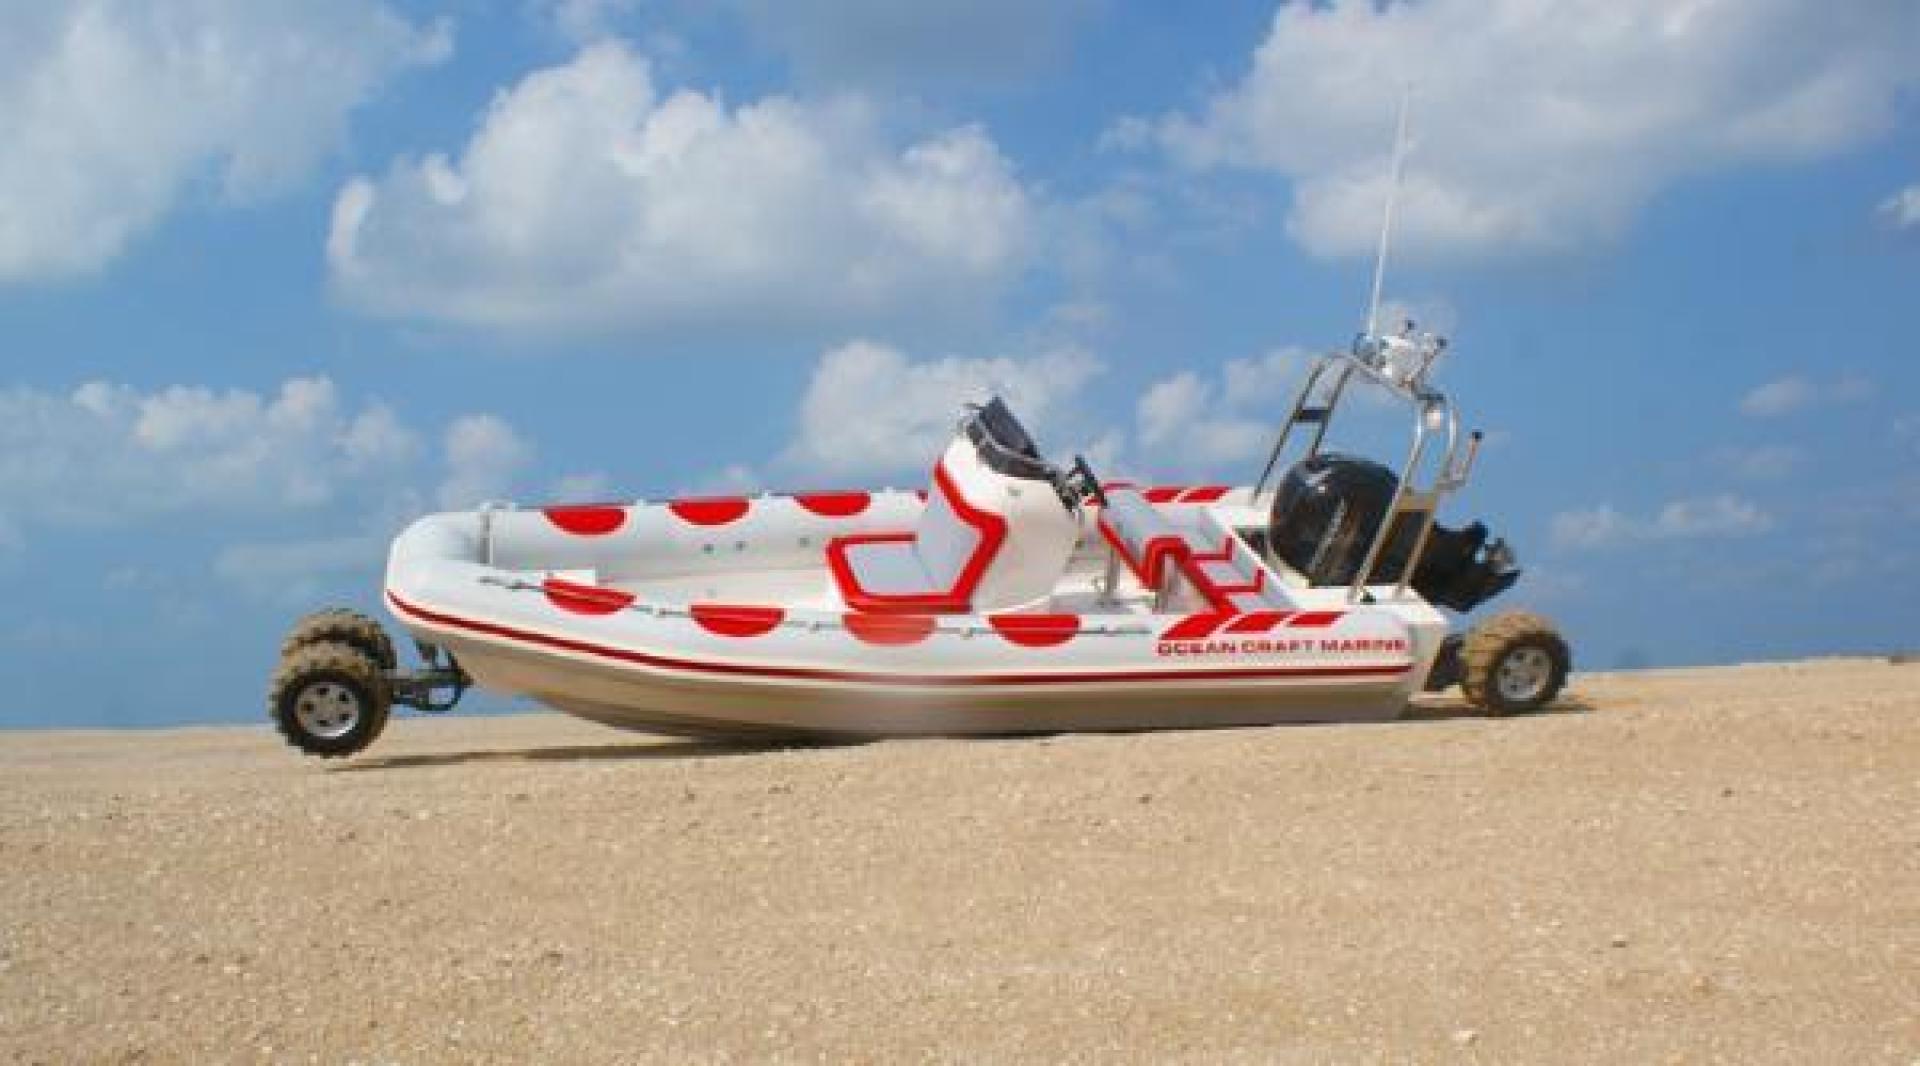 Ocean Craft Marine-7.1 M Amphibious 2021-Ocean Craft Marine 7.1 M Amphibious Fort Lauderdale-Florida-United States-1523222 | Thumbnail